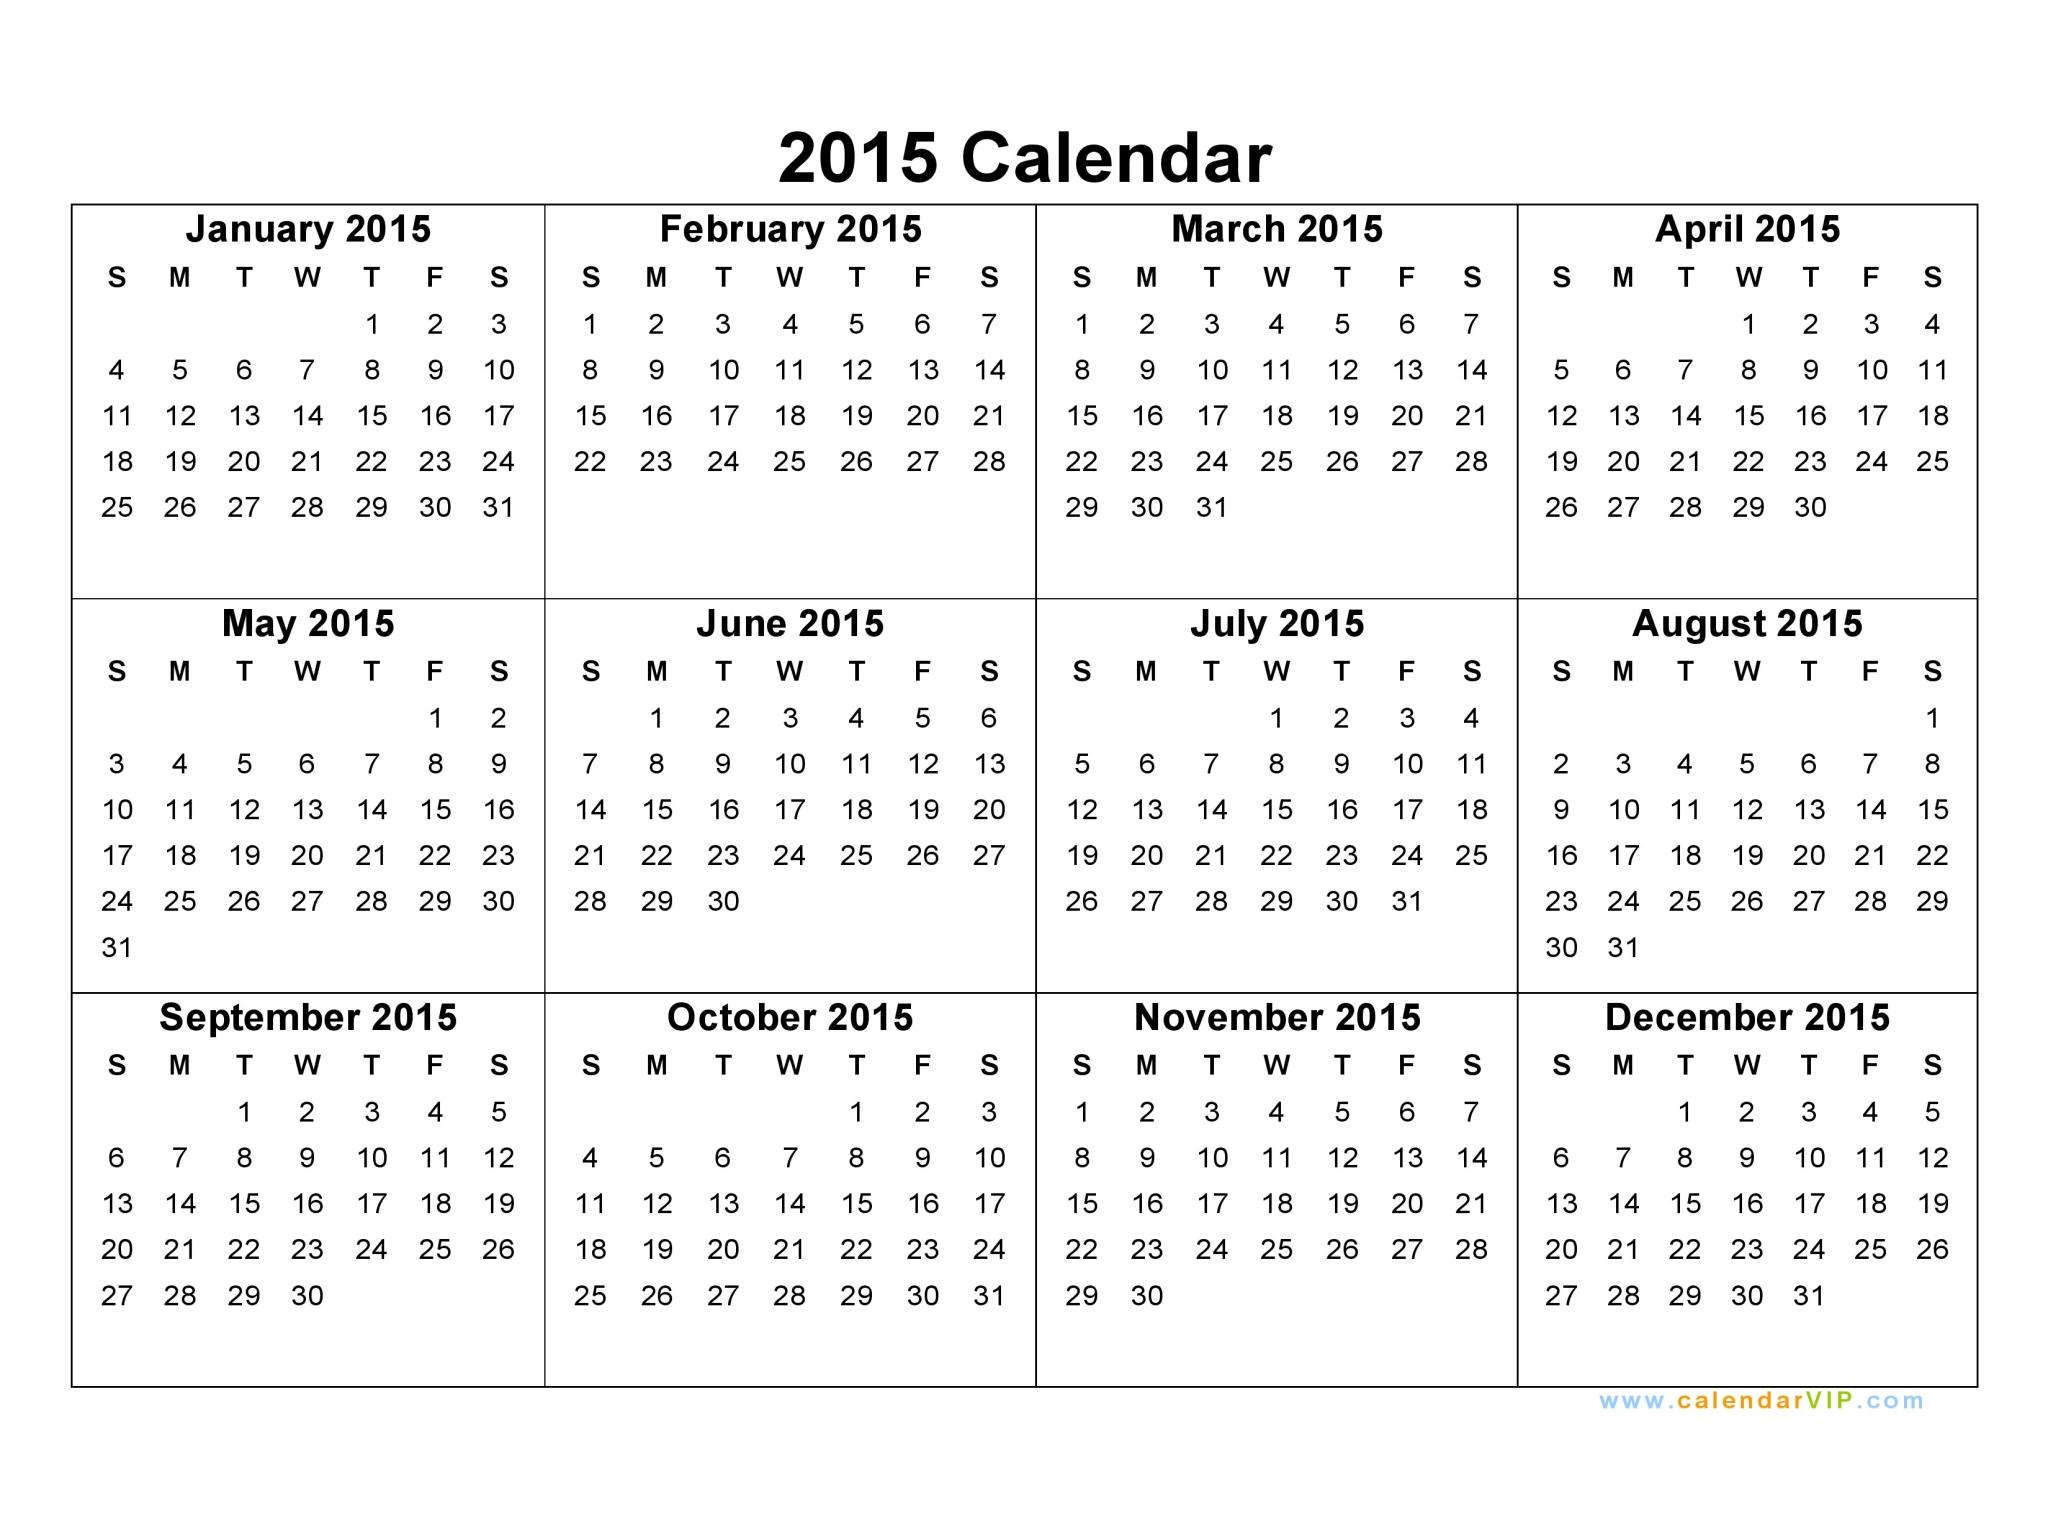 Yearly Calendar 2015   2017 calendar with holidays